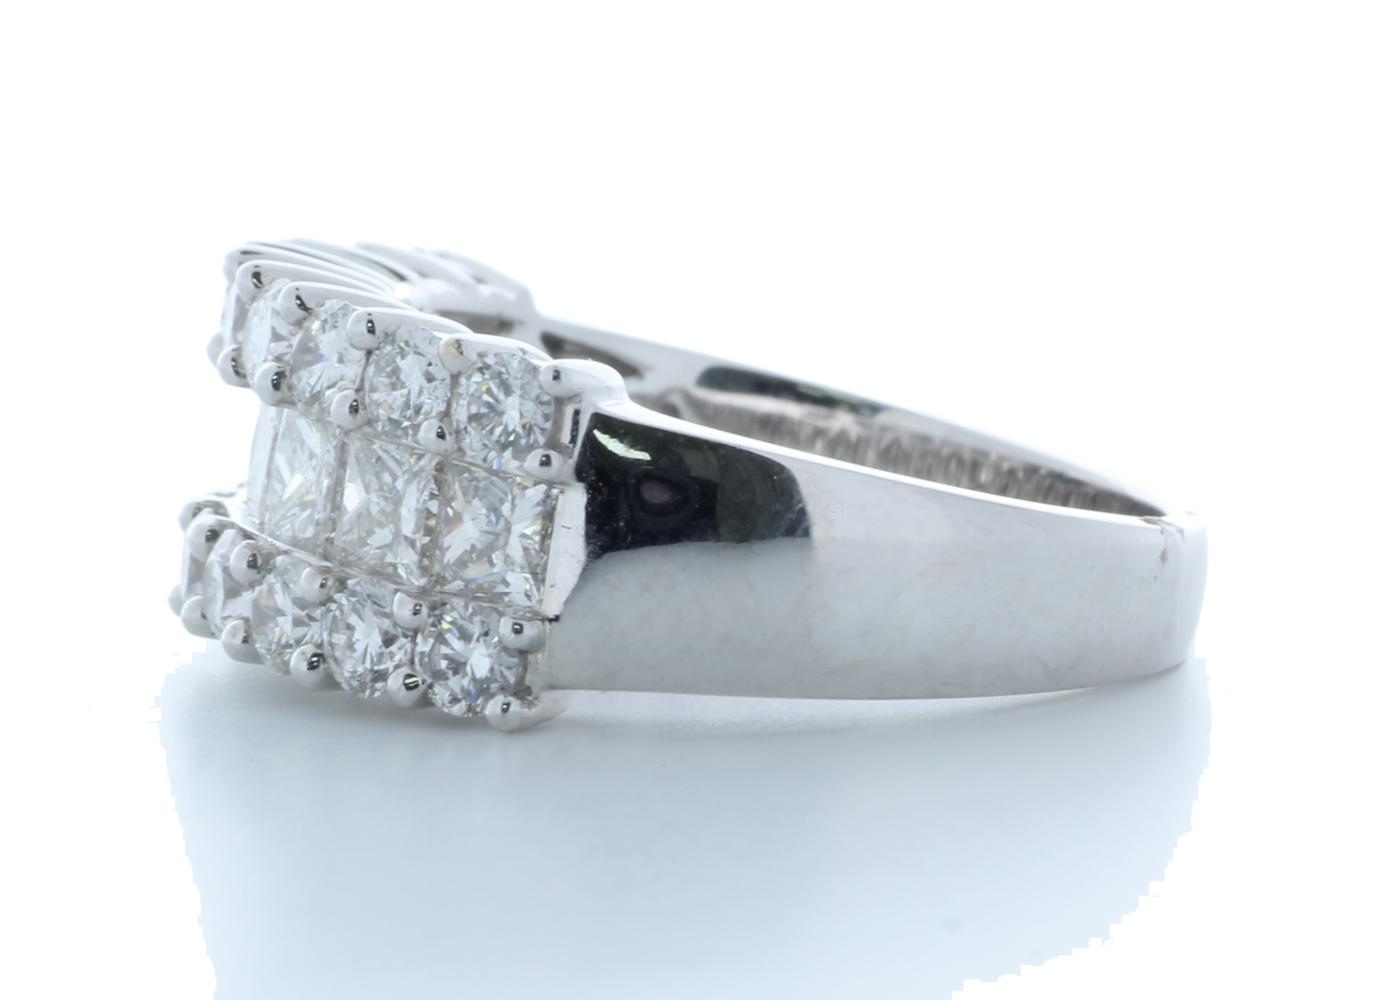 18k White Gold Claw Set Semi Eternity Diamond Ring 2.43 Carats - Image 2 of 4